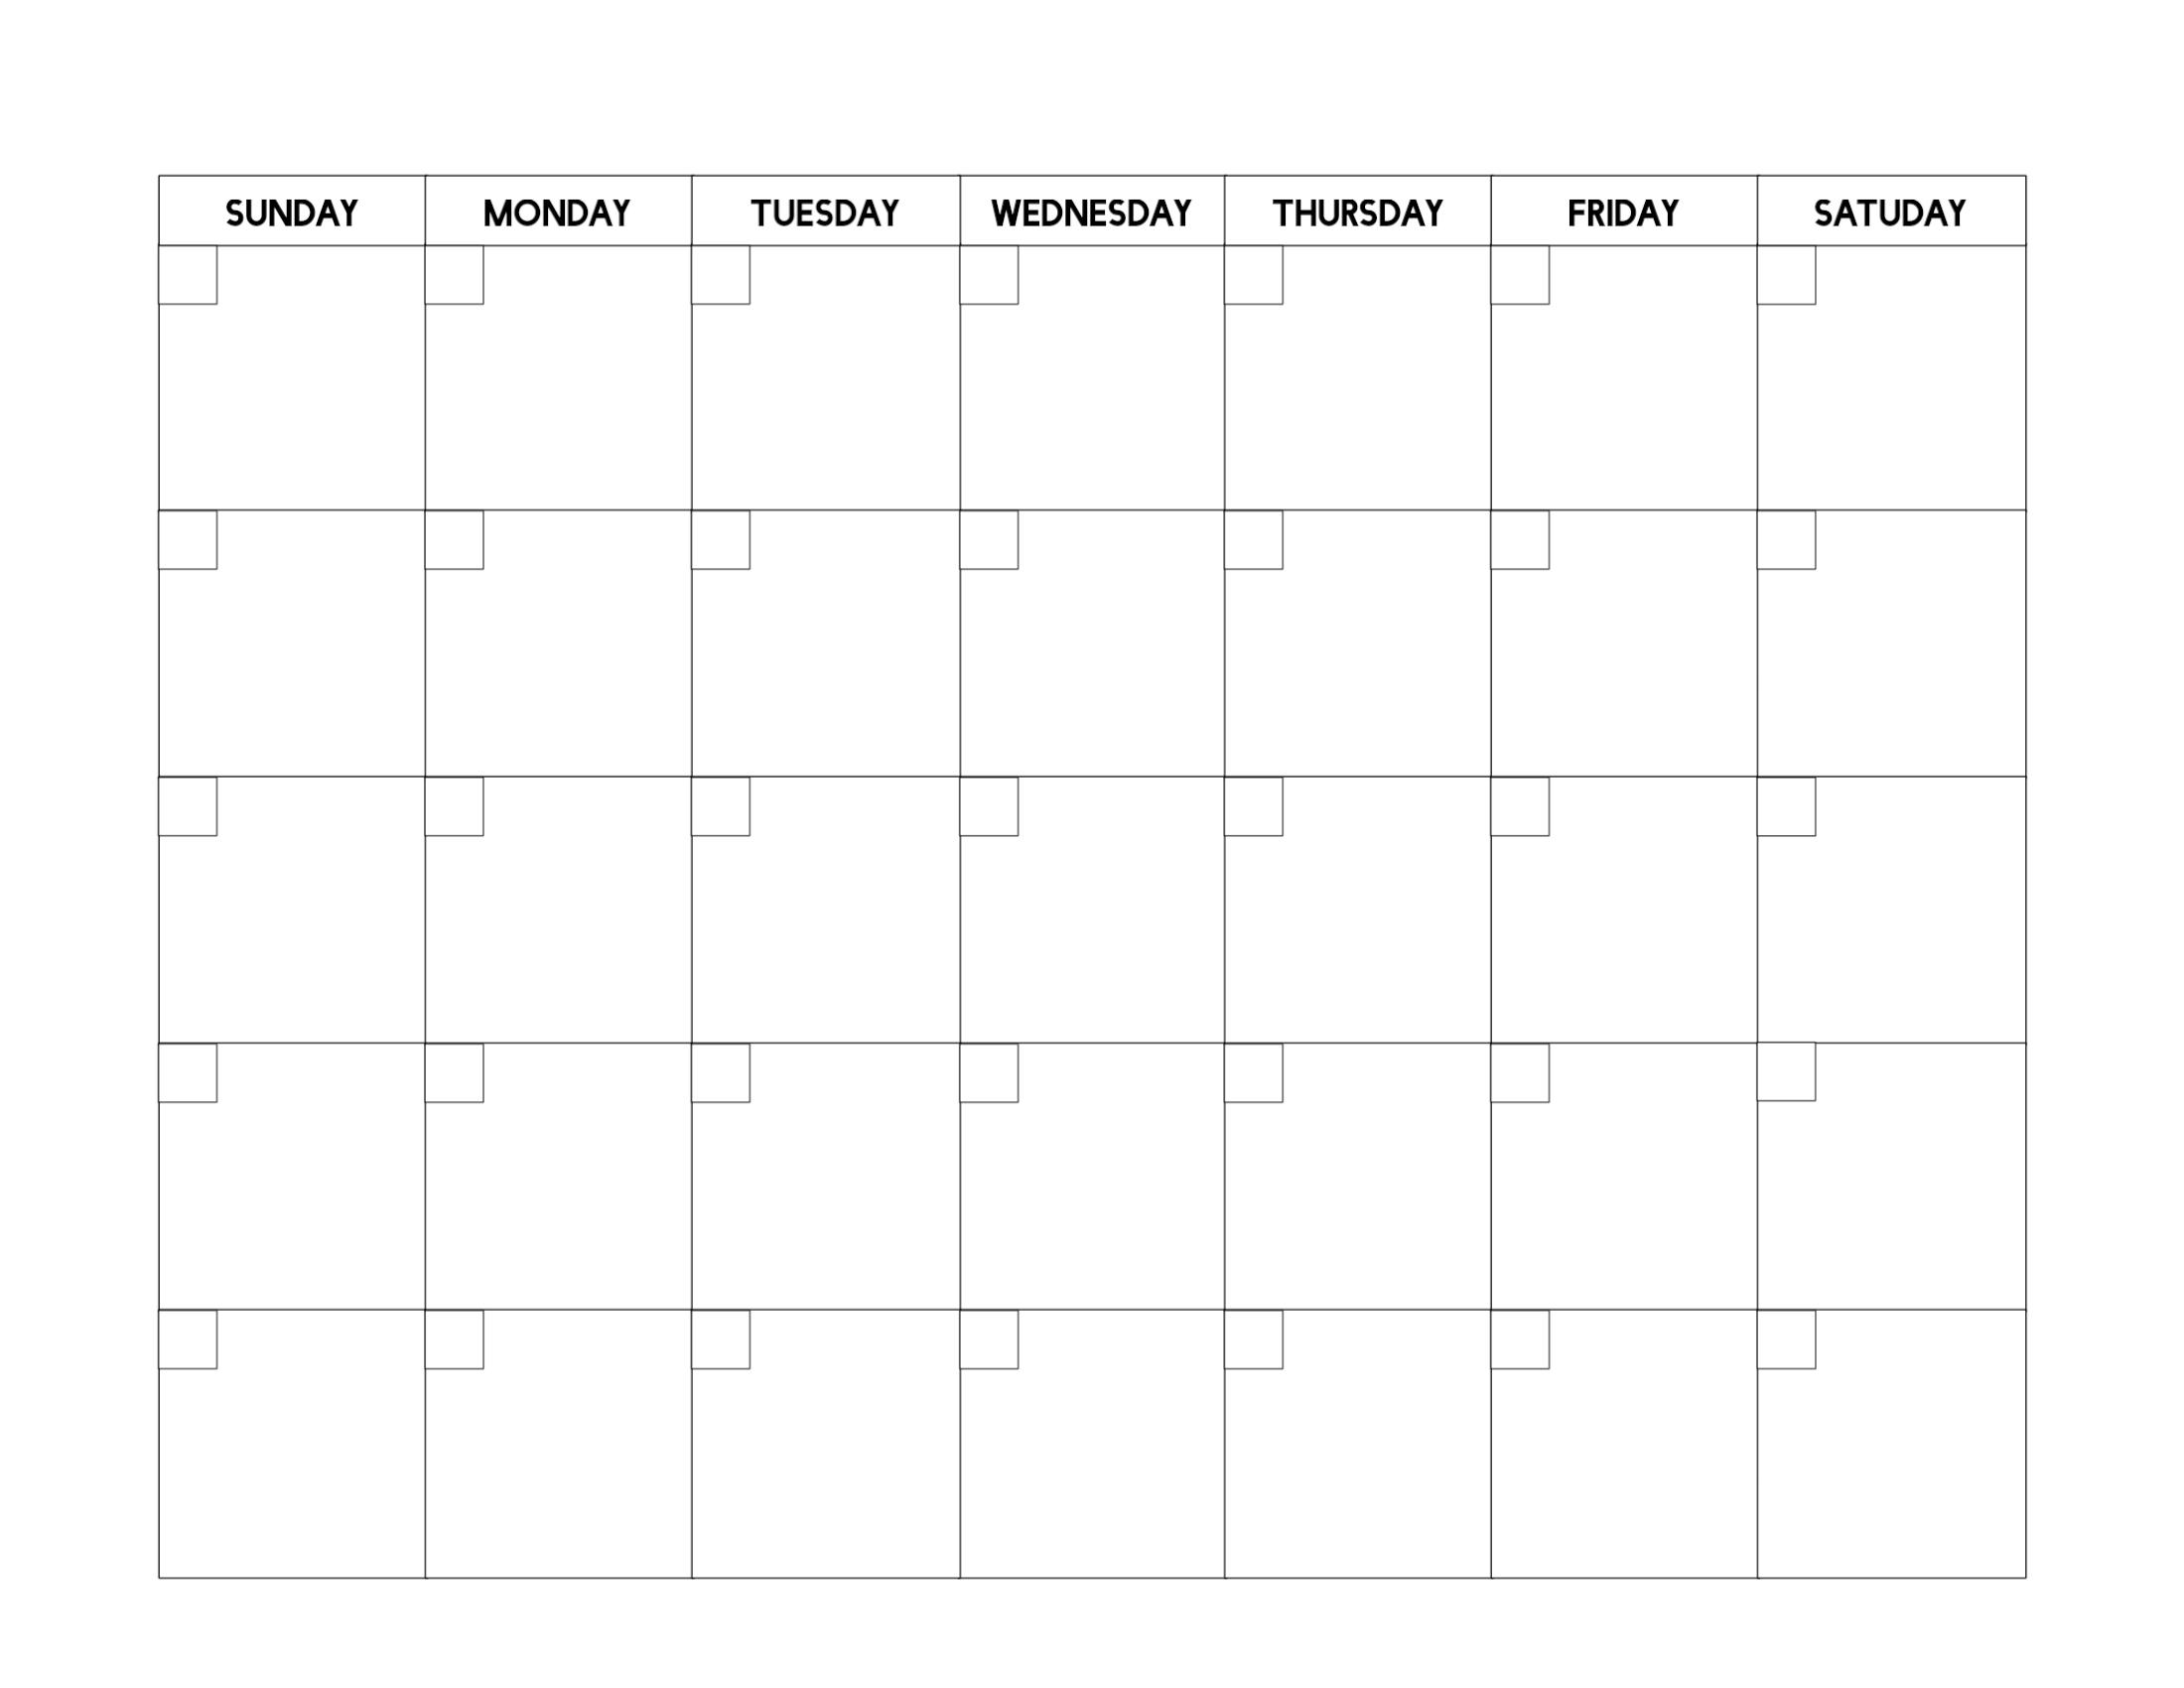 Free Printable Blank Calendar Template - Paper Trail Design  Printable Fill In Calendar Temoplate